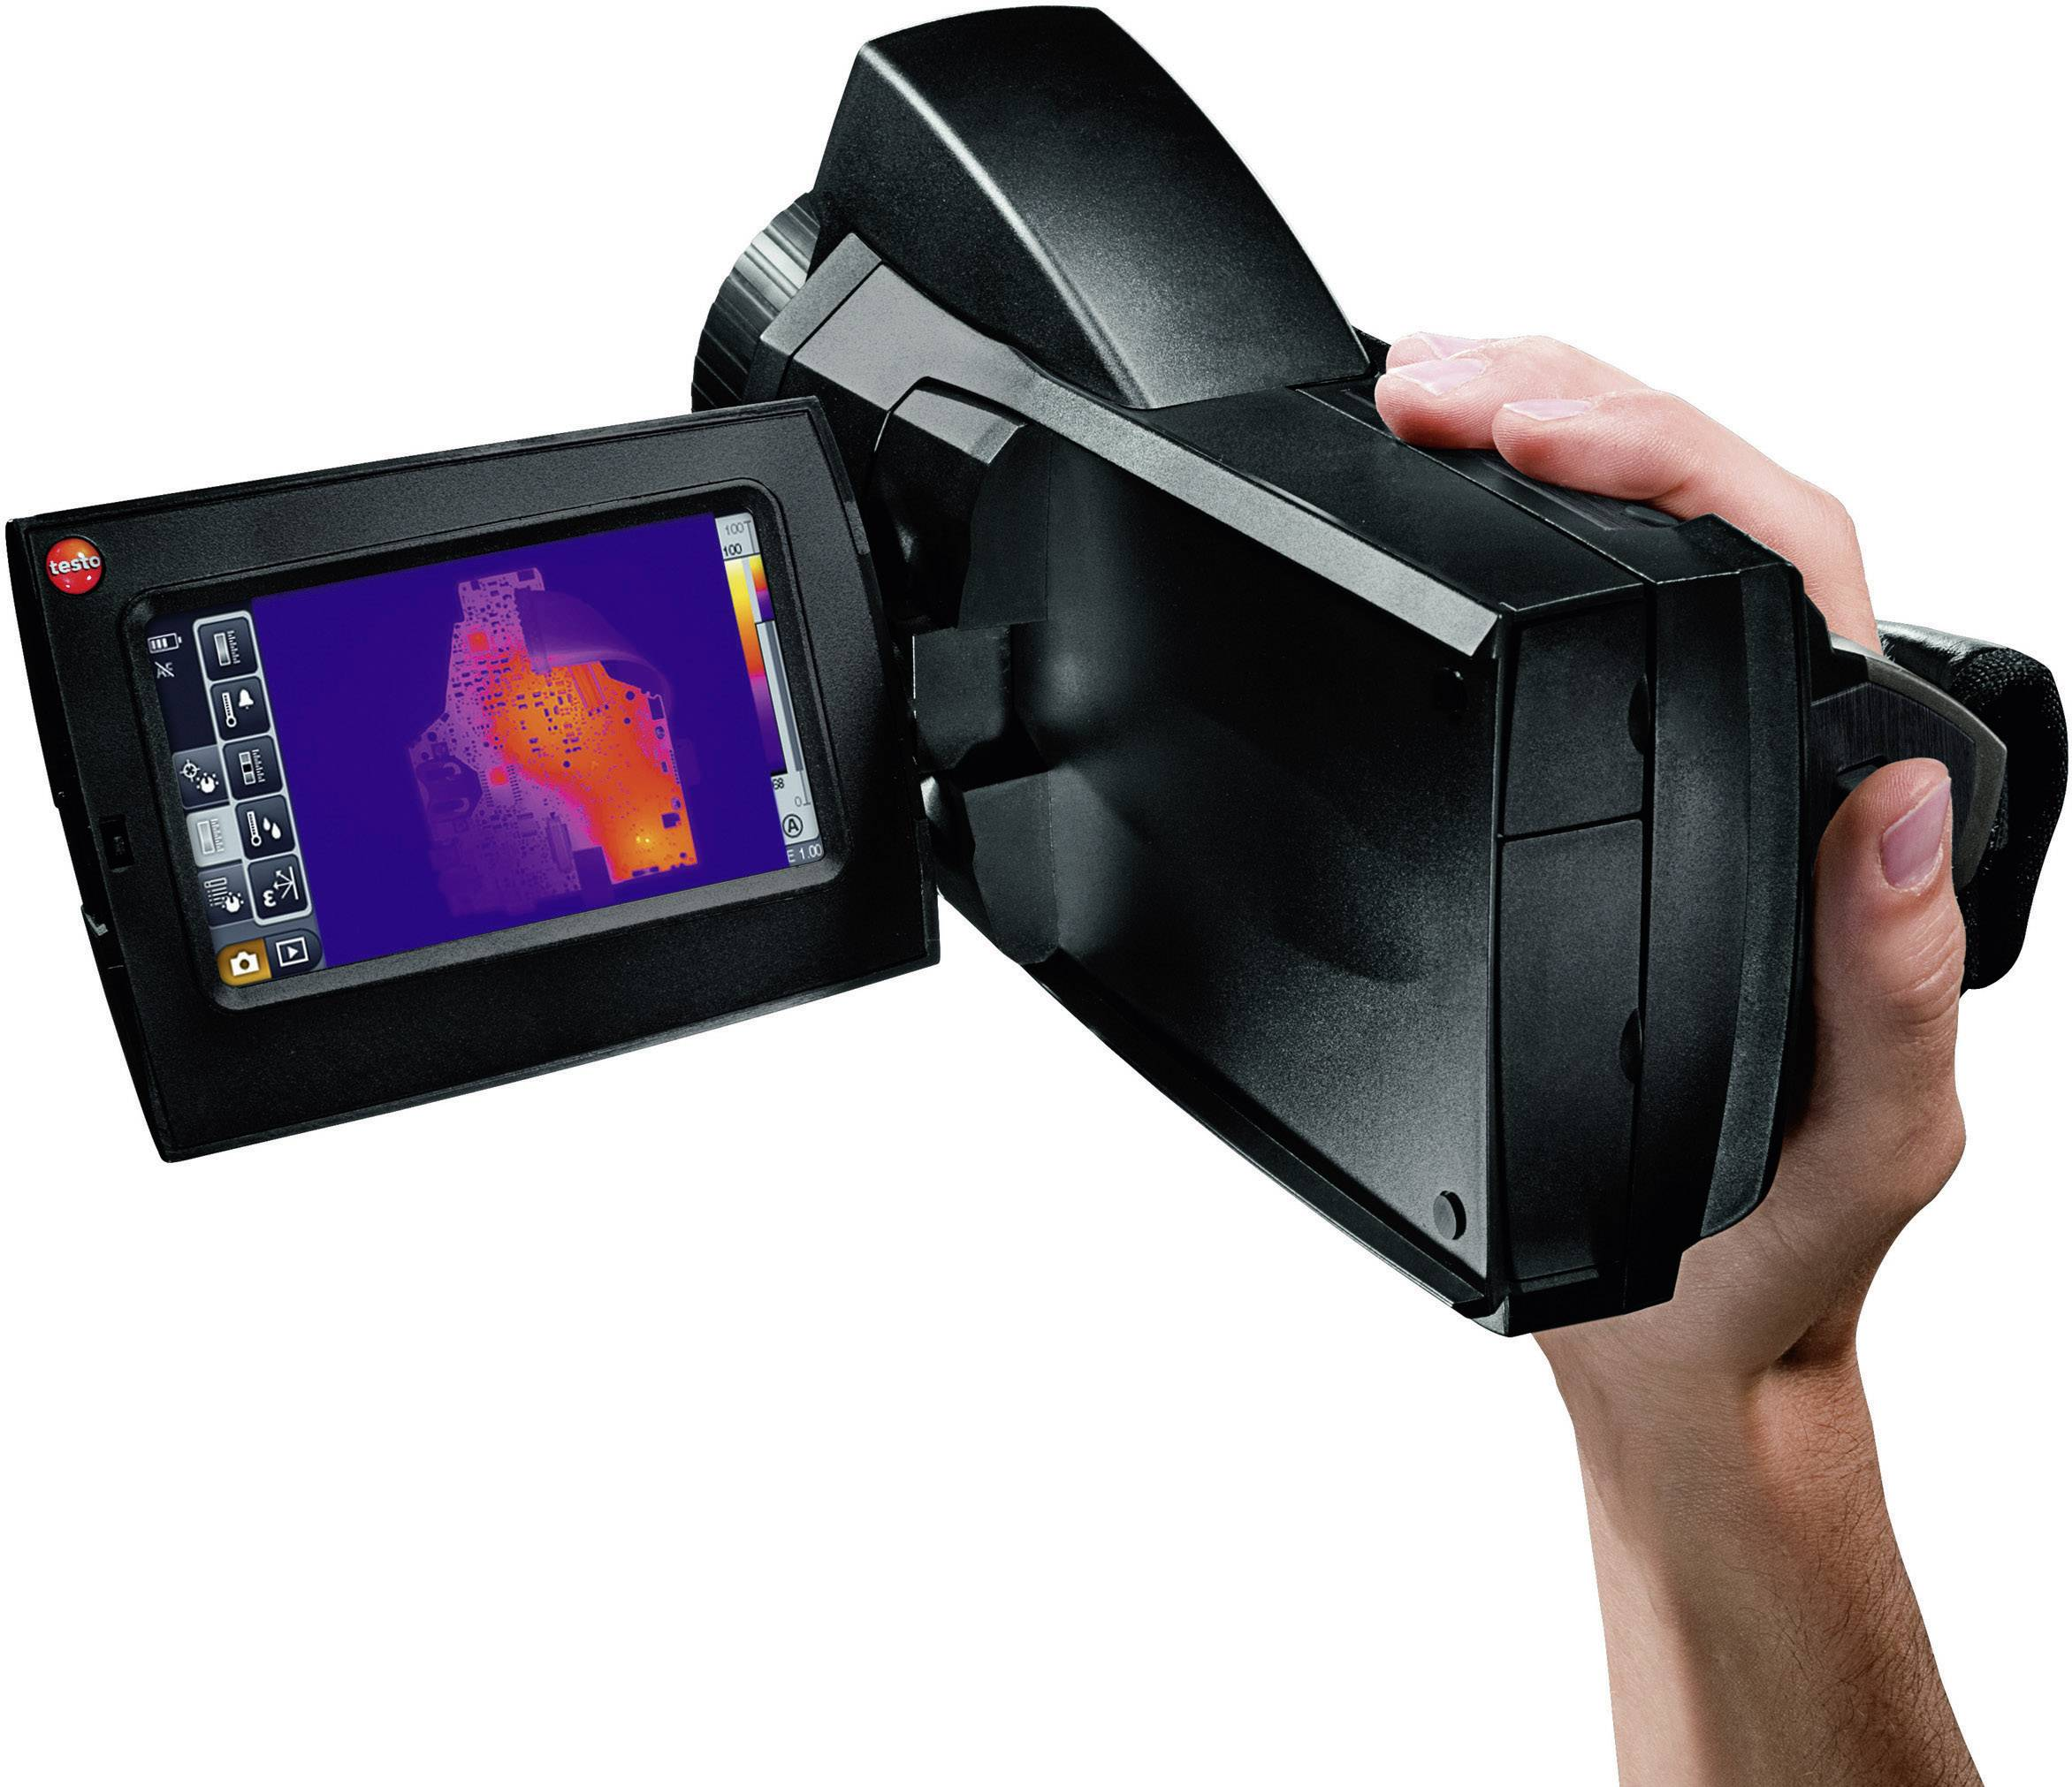 Termálna kamera testo 890-2 0563 0890 V2, 640 x 320 pix